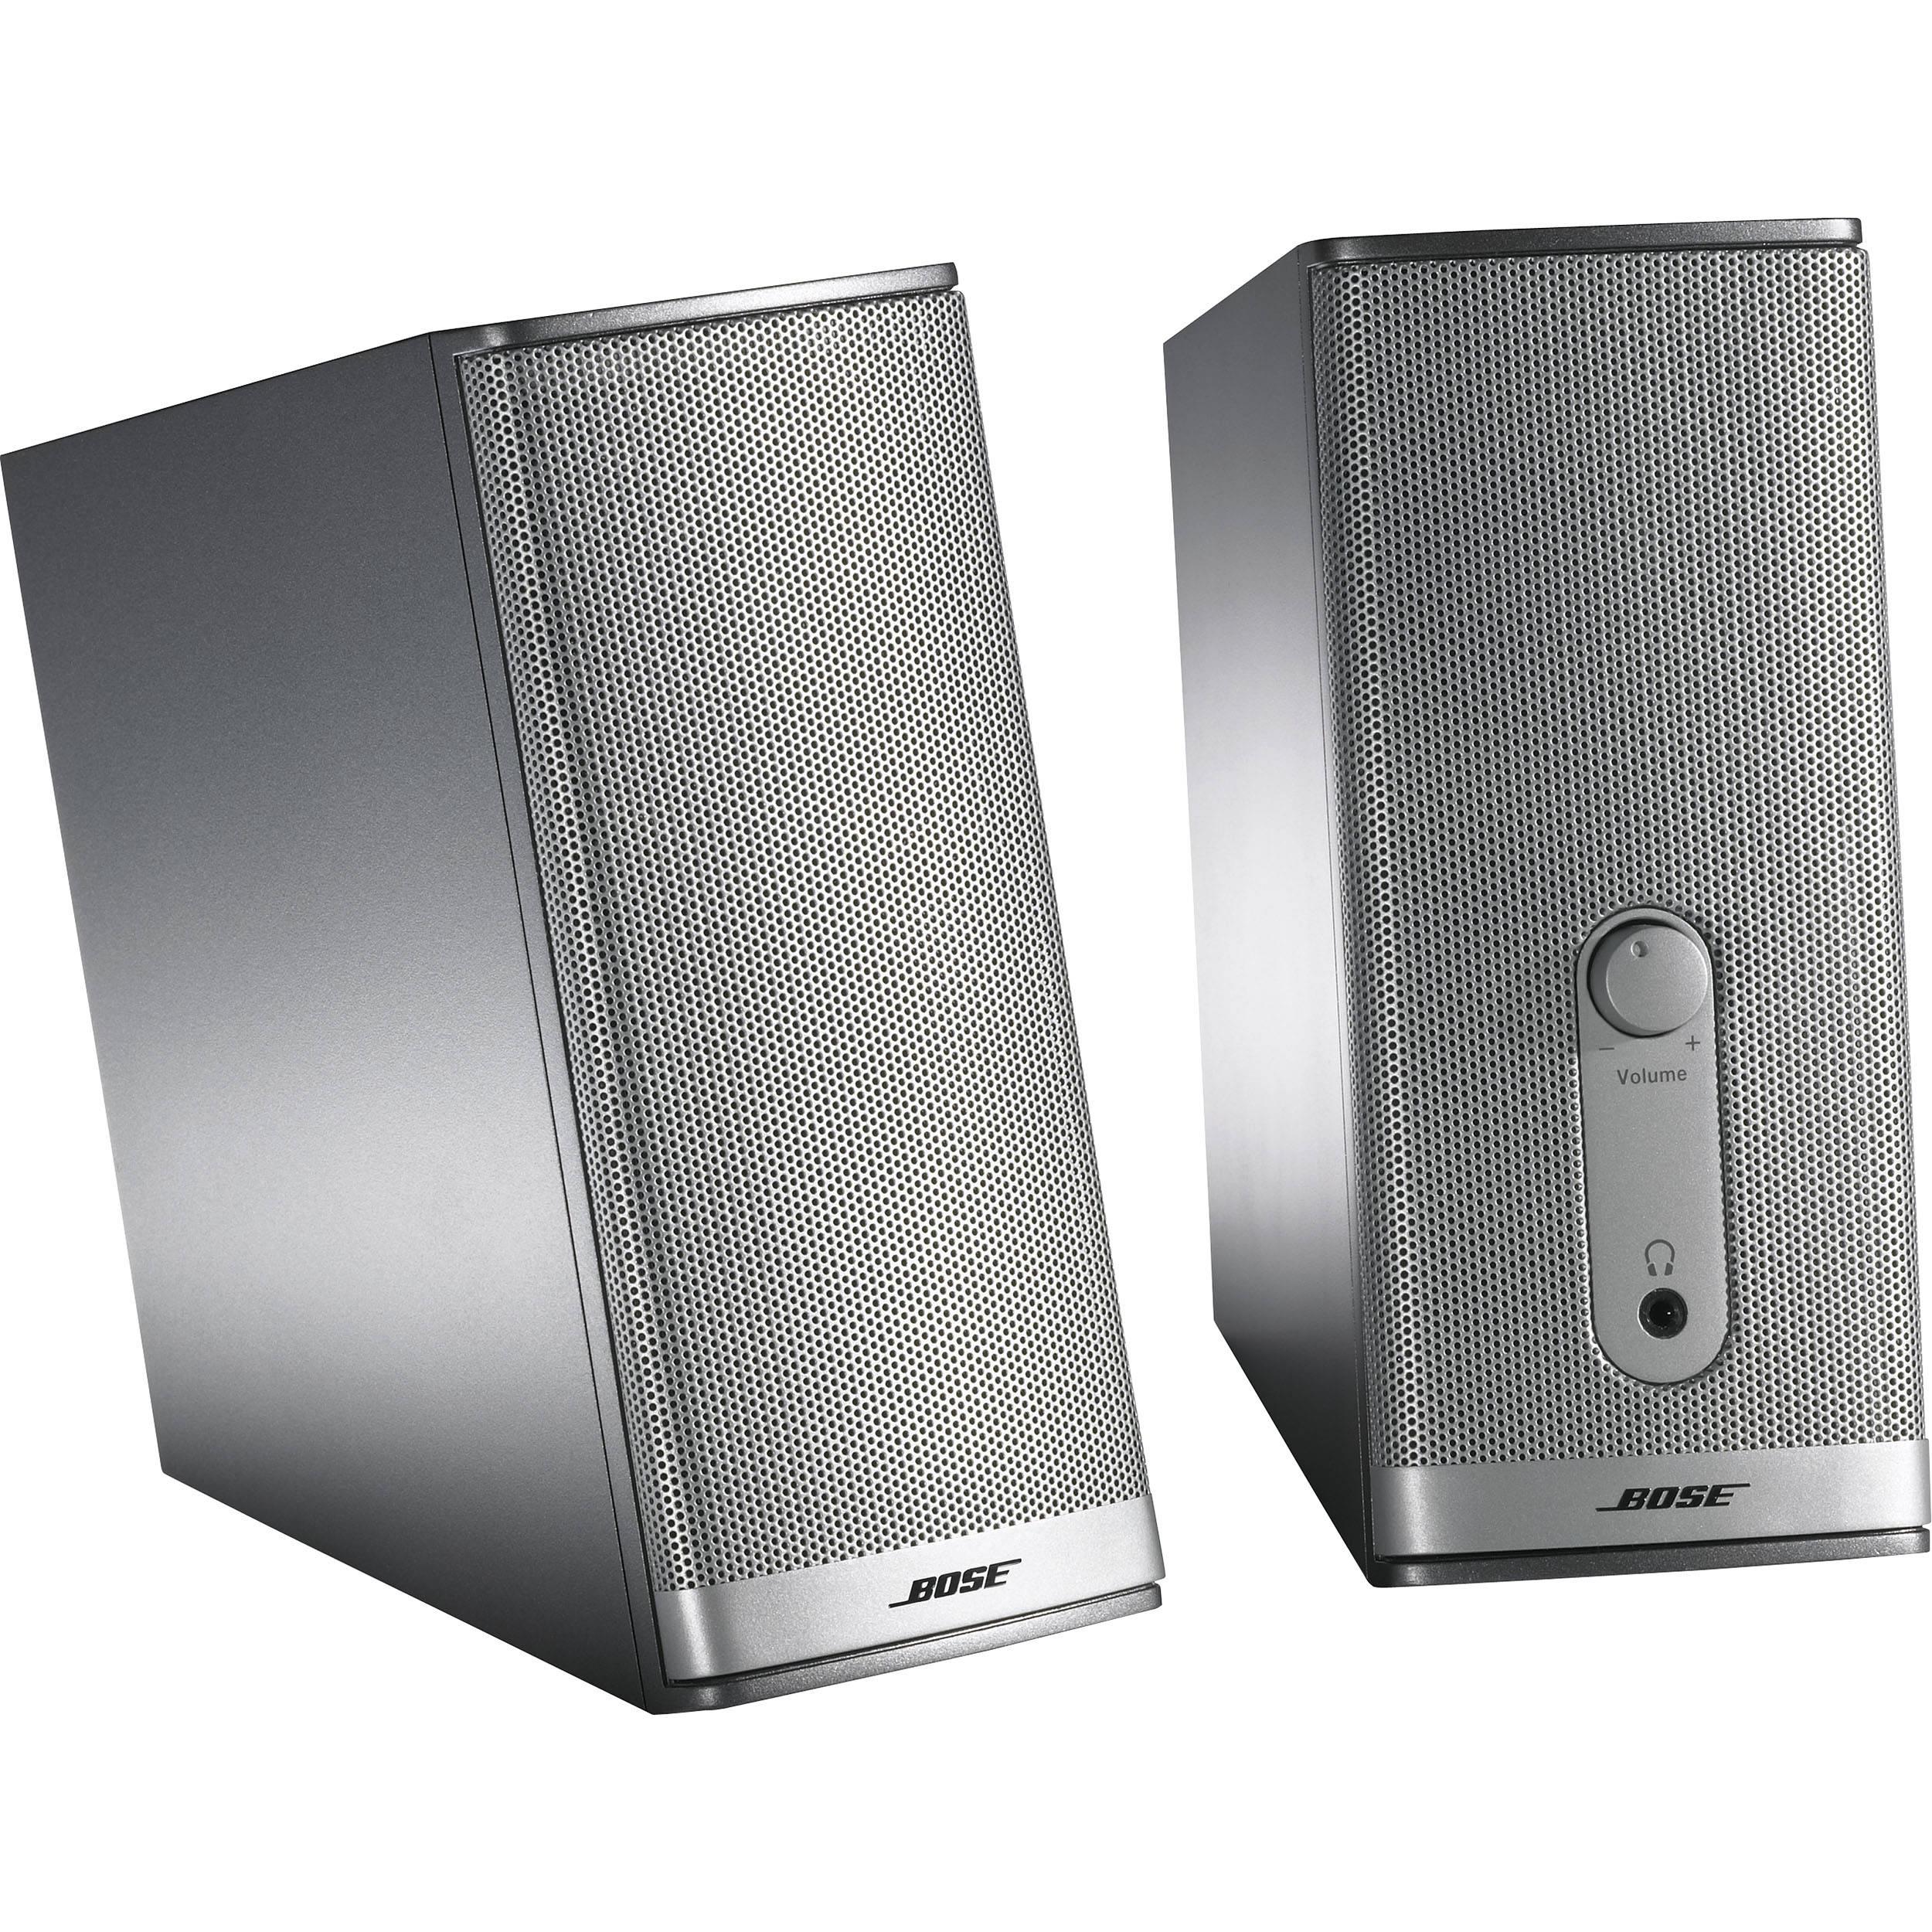 Bose Companion 8 Series II Multimedia Speaker System (Graphite)